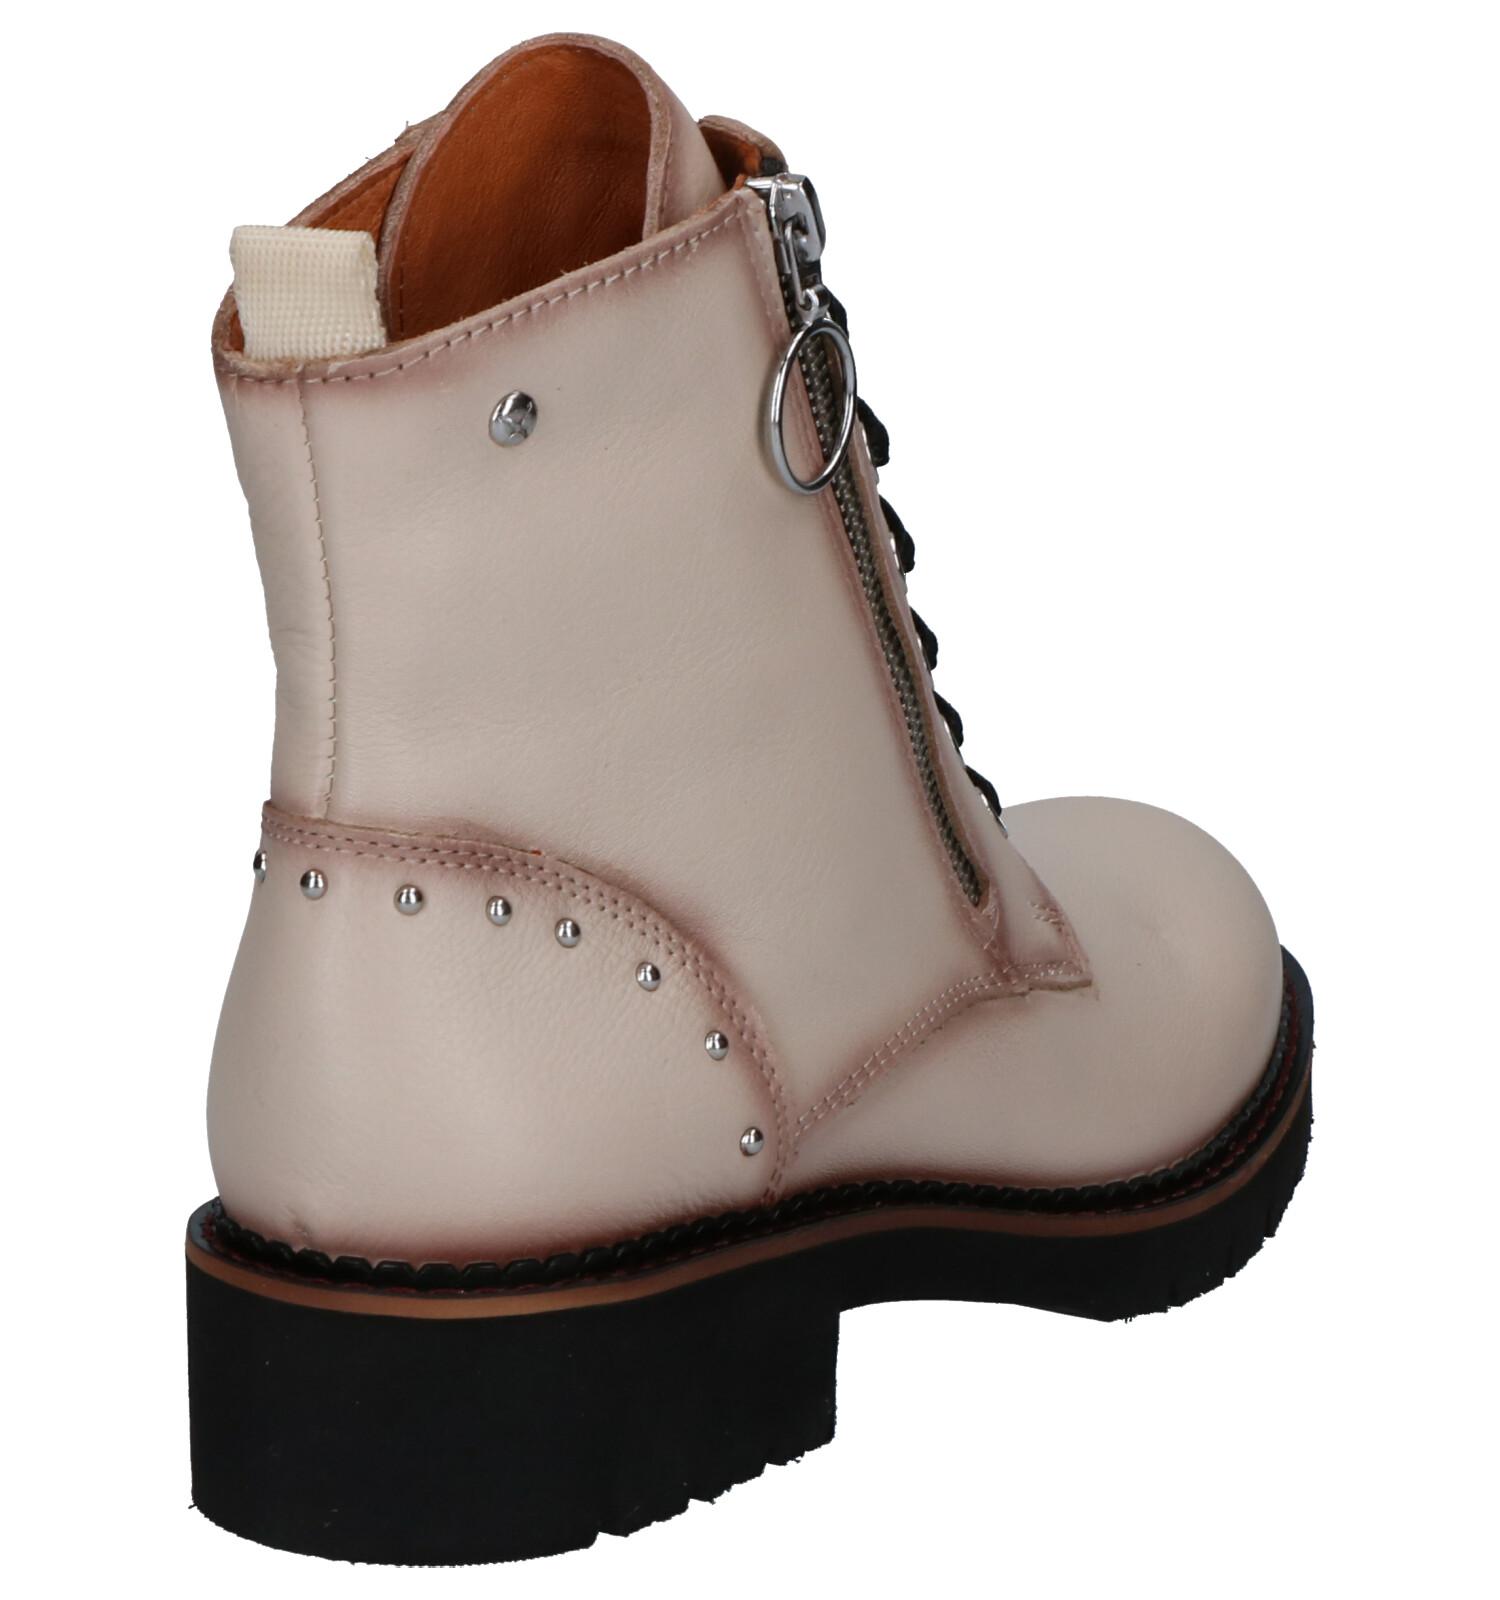 Pikolinos Boots Beige Pikolinos Vicar Vicar wOPuTXilkZ